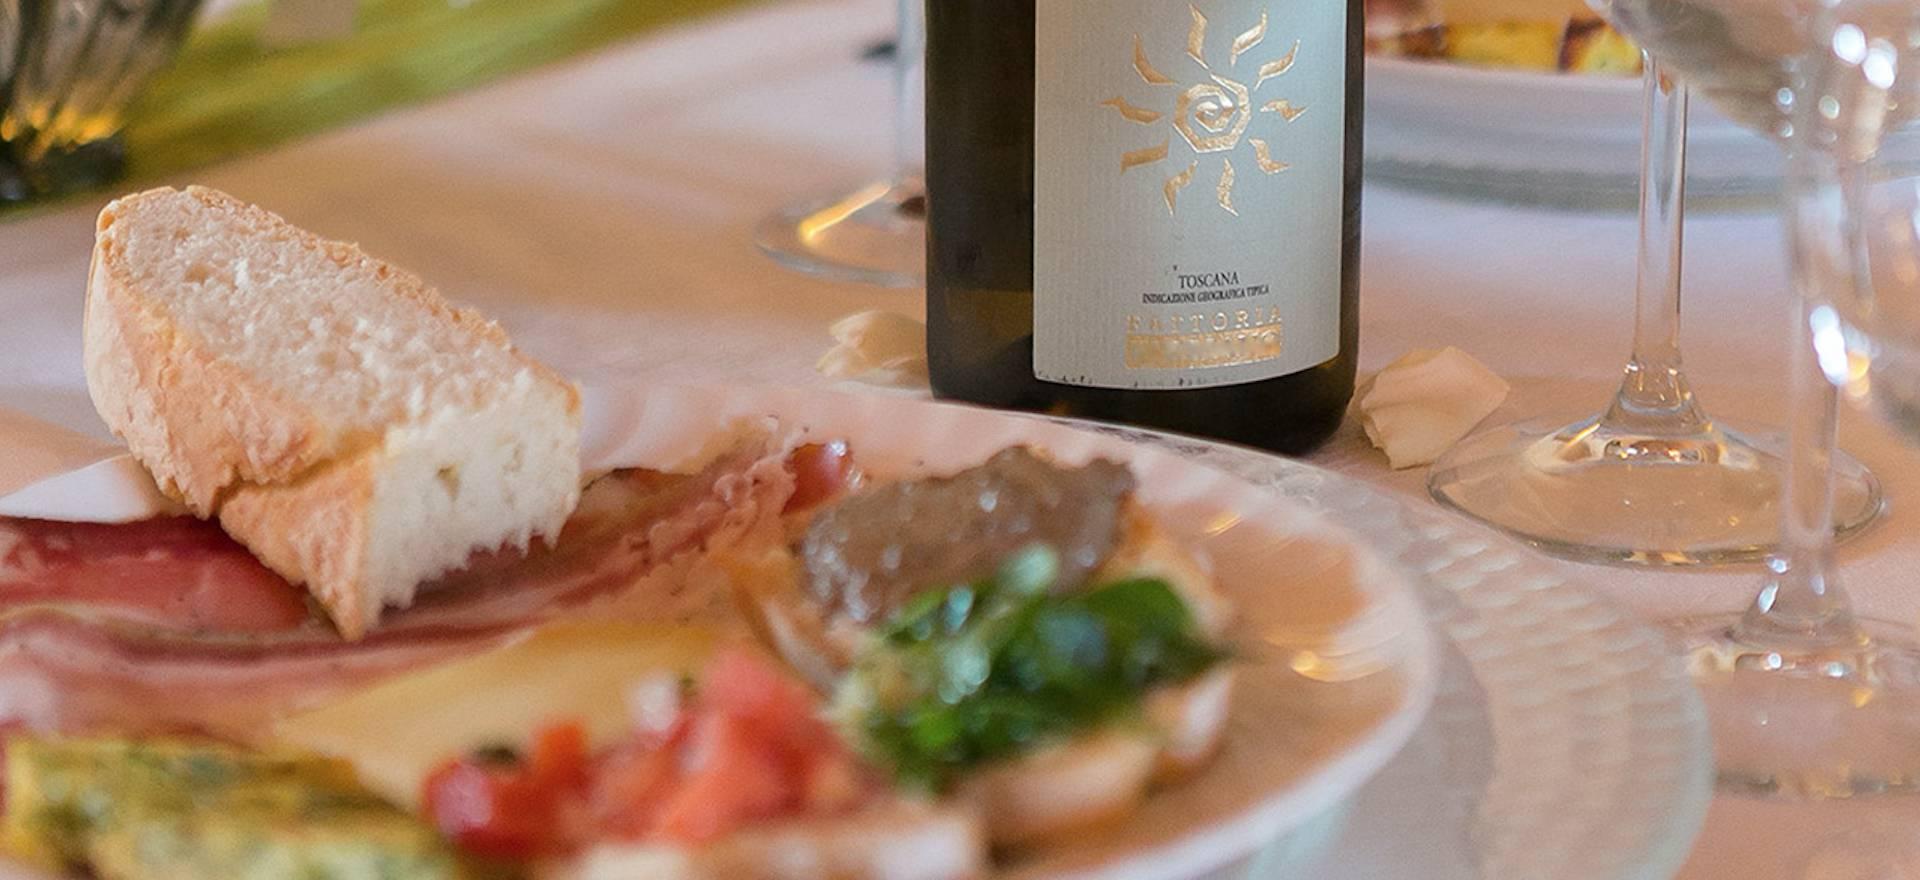 Agriturismo Toscana Agriturismo per famiglie in Toscana con cena di pizza